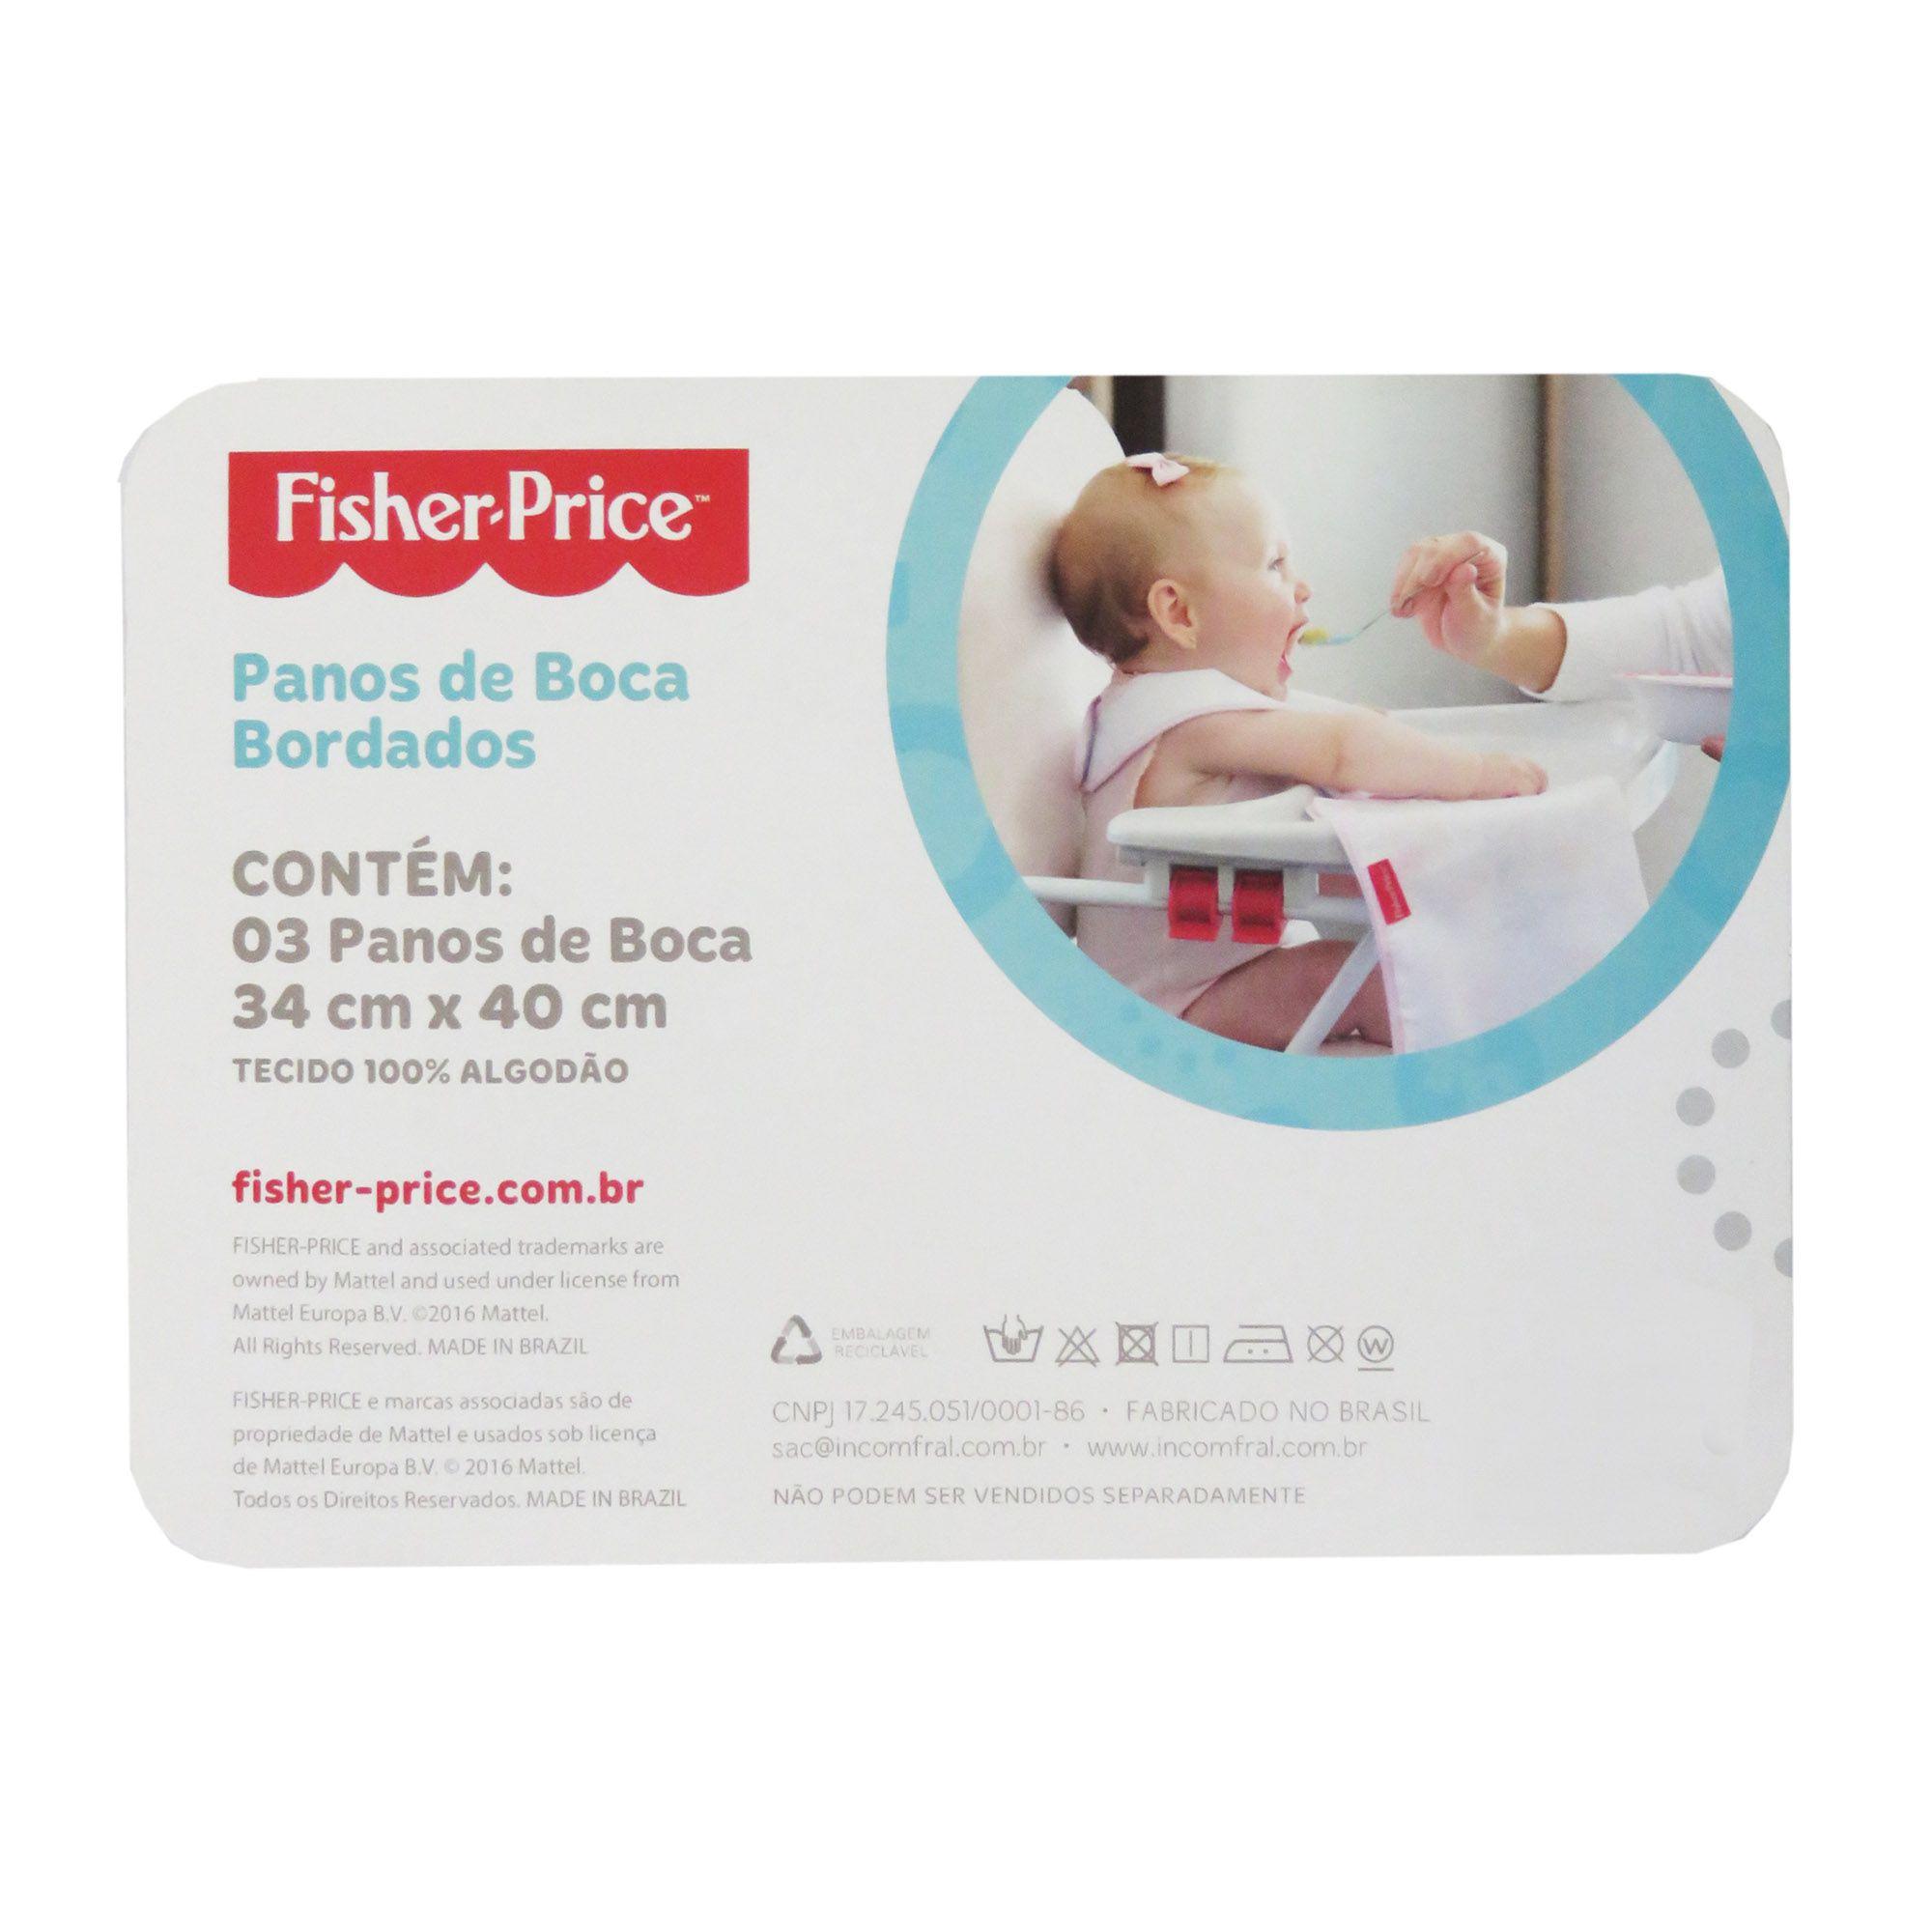 Pano de Boca Incomfral Fisher-Price - Estampado - Rosa Claro